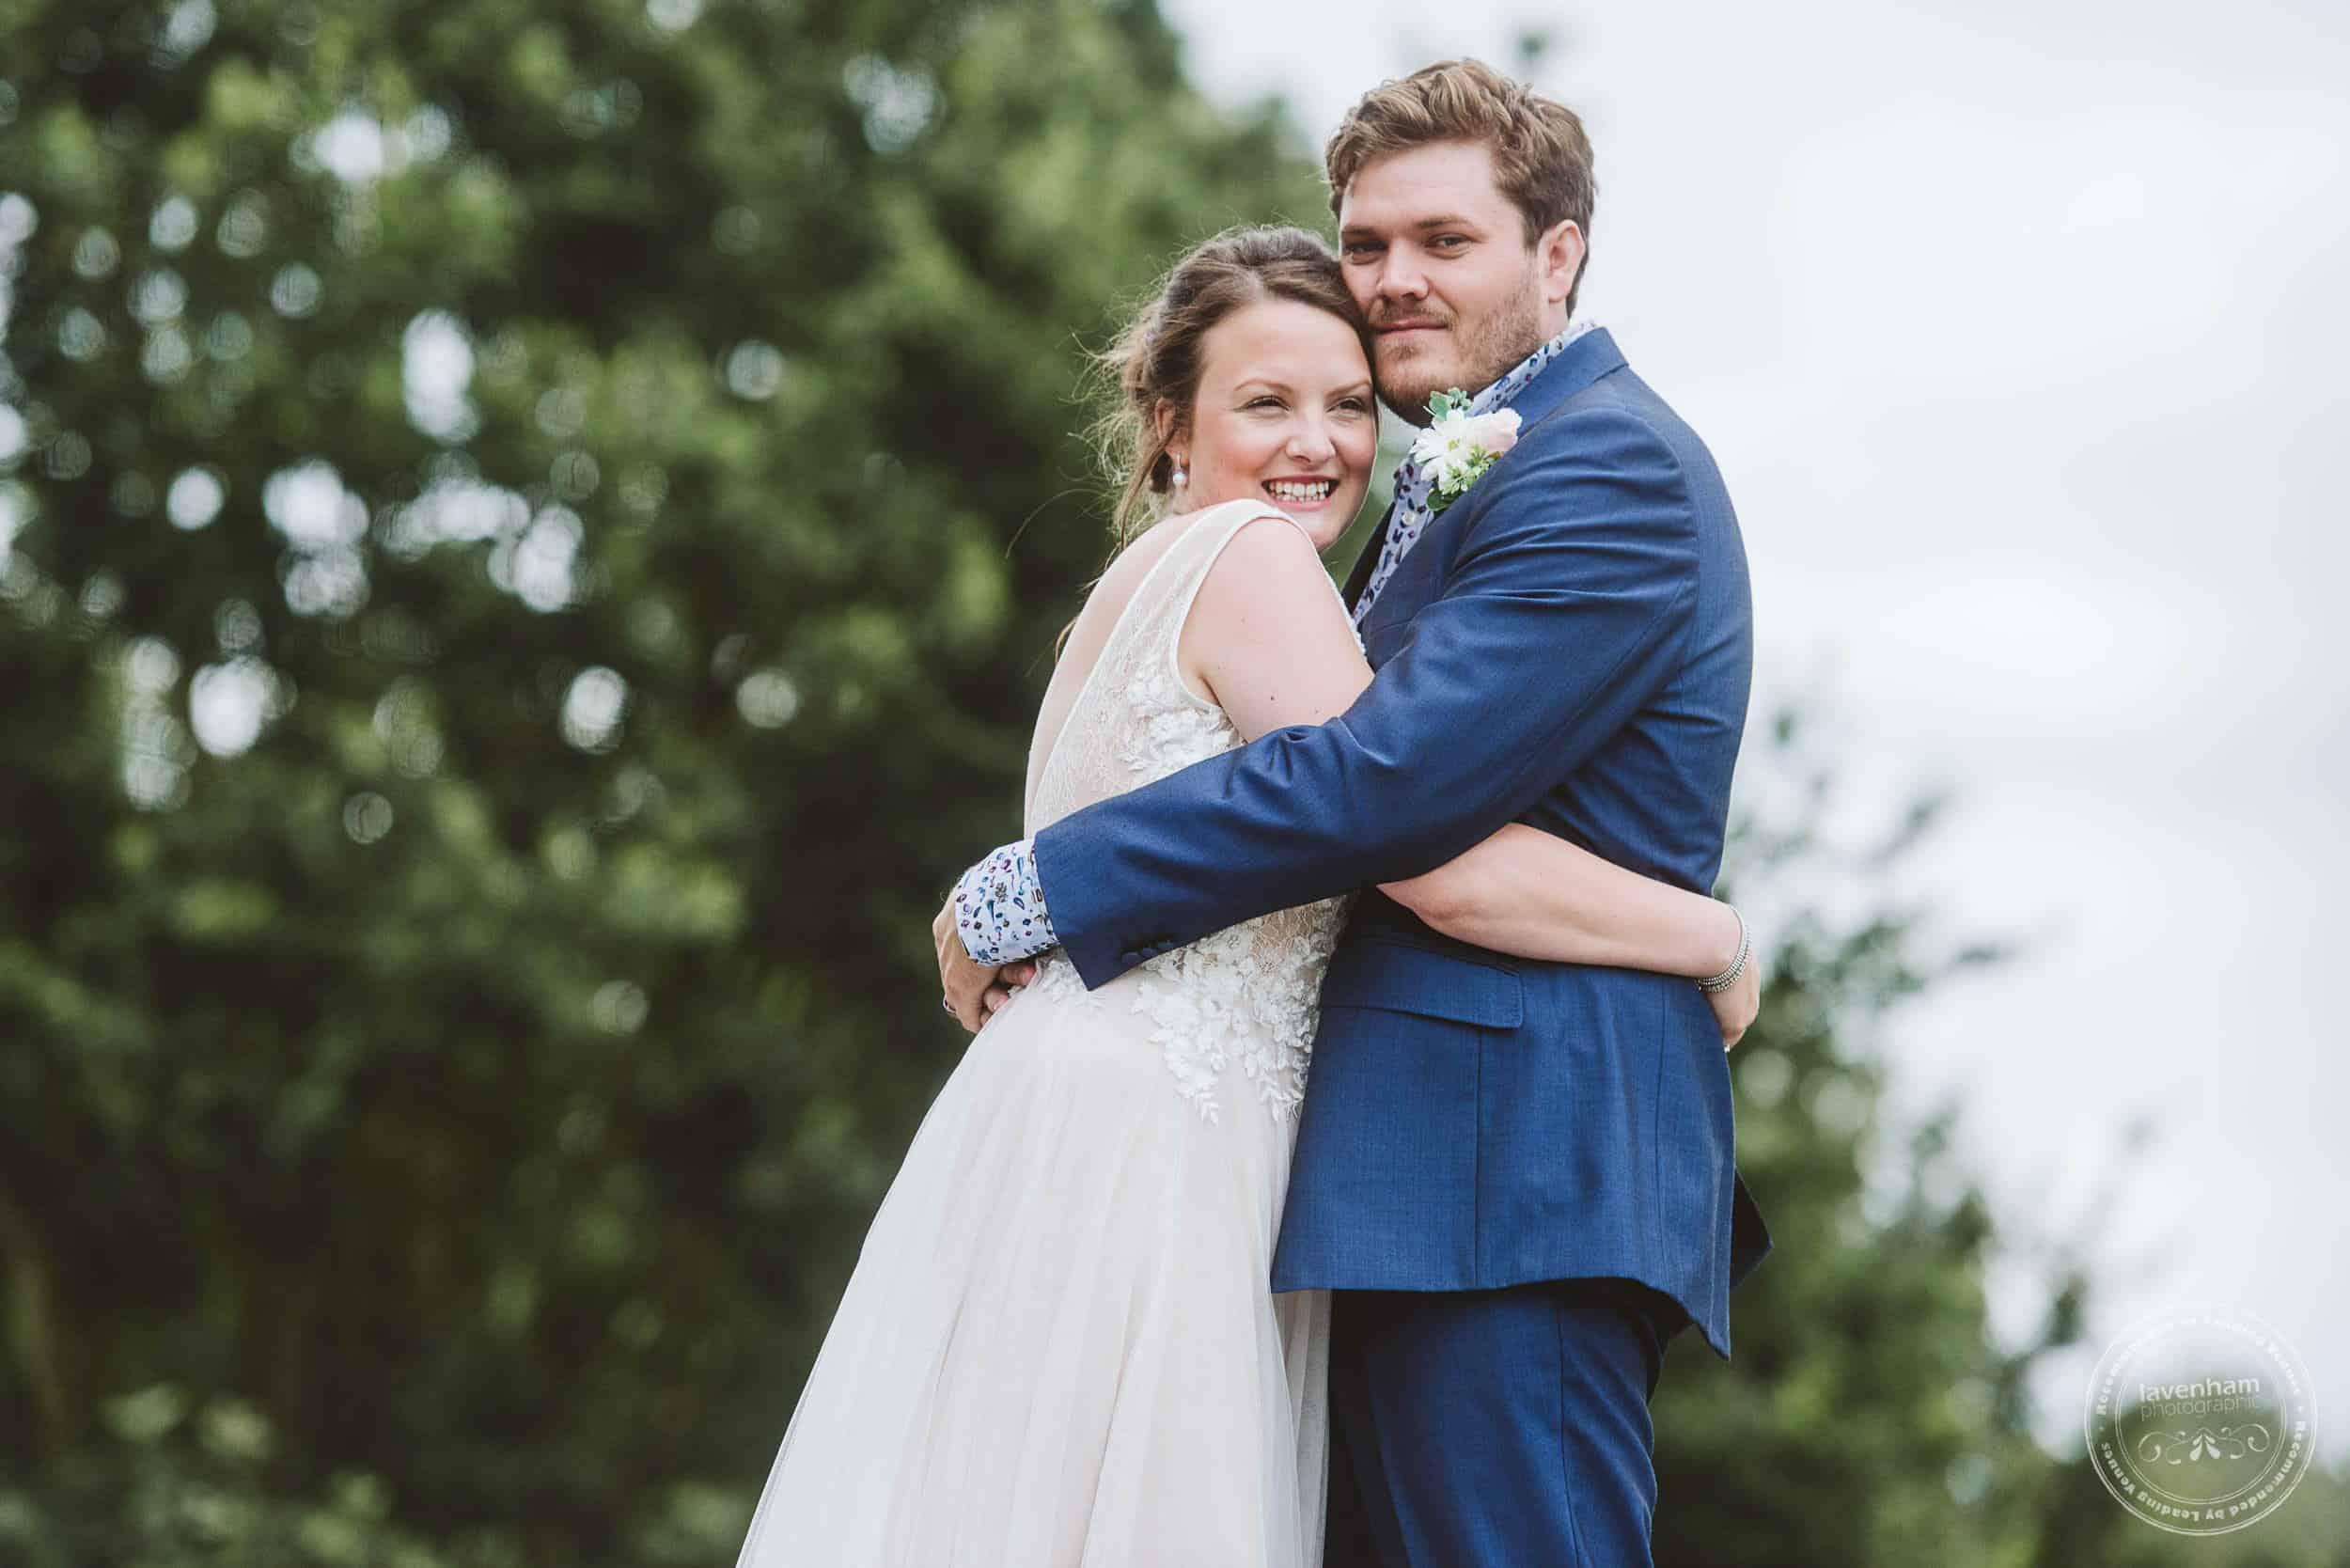 180818 Marks Hall Wedding Photography Lavenham Photographic 095